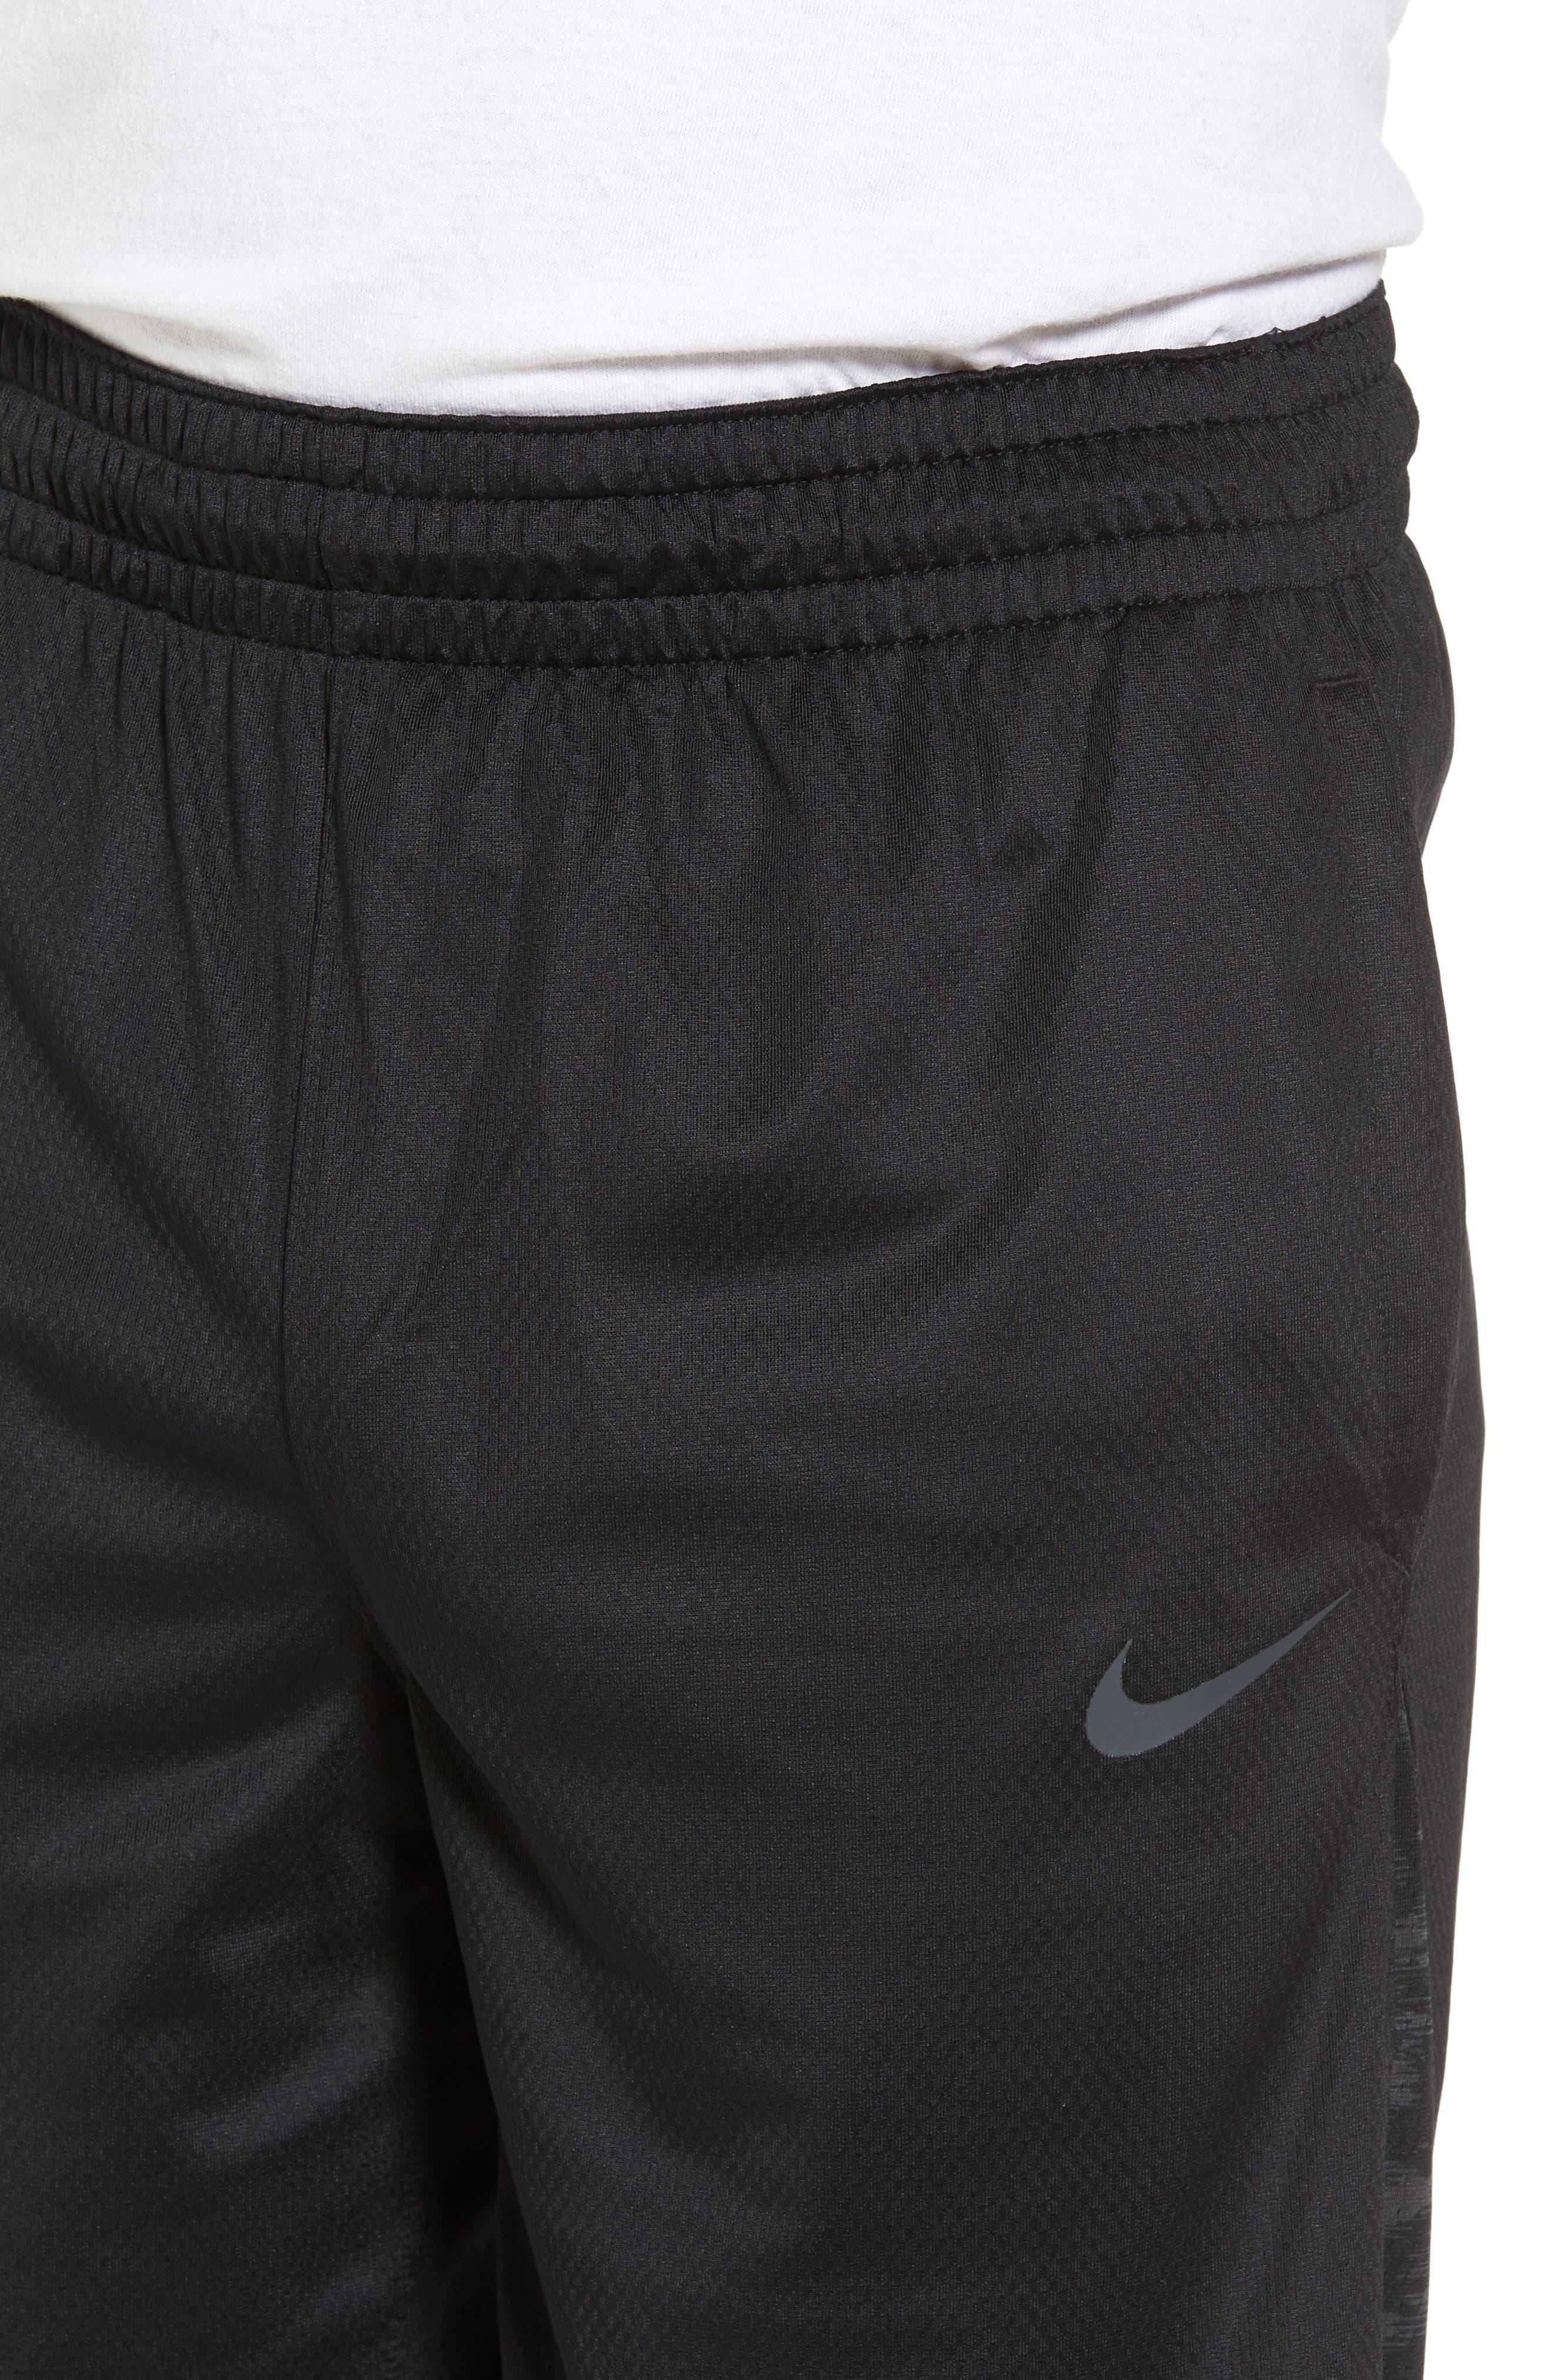 Basketball Shorts,                             Alternate thumbnail 4, color,                             010